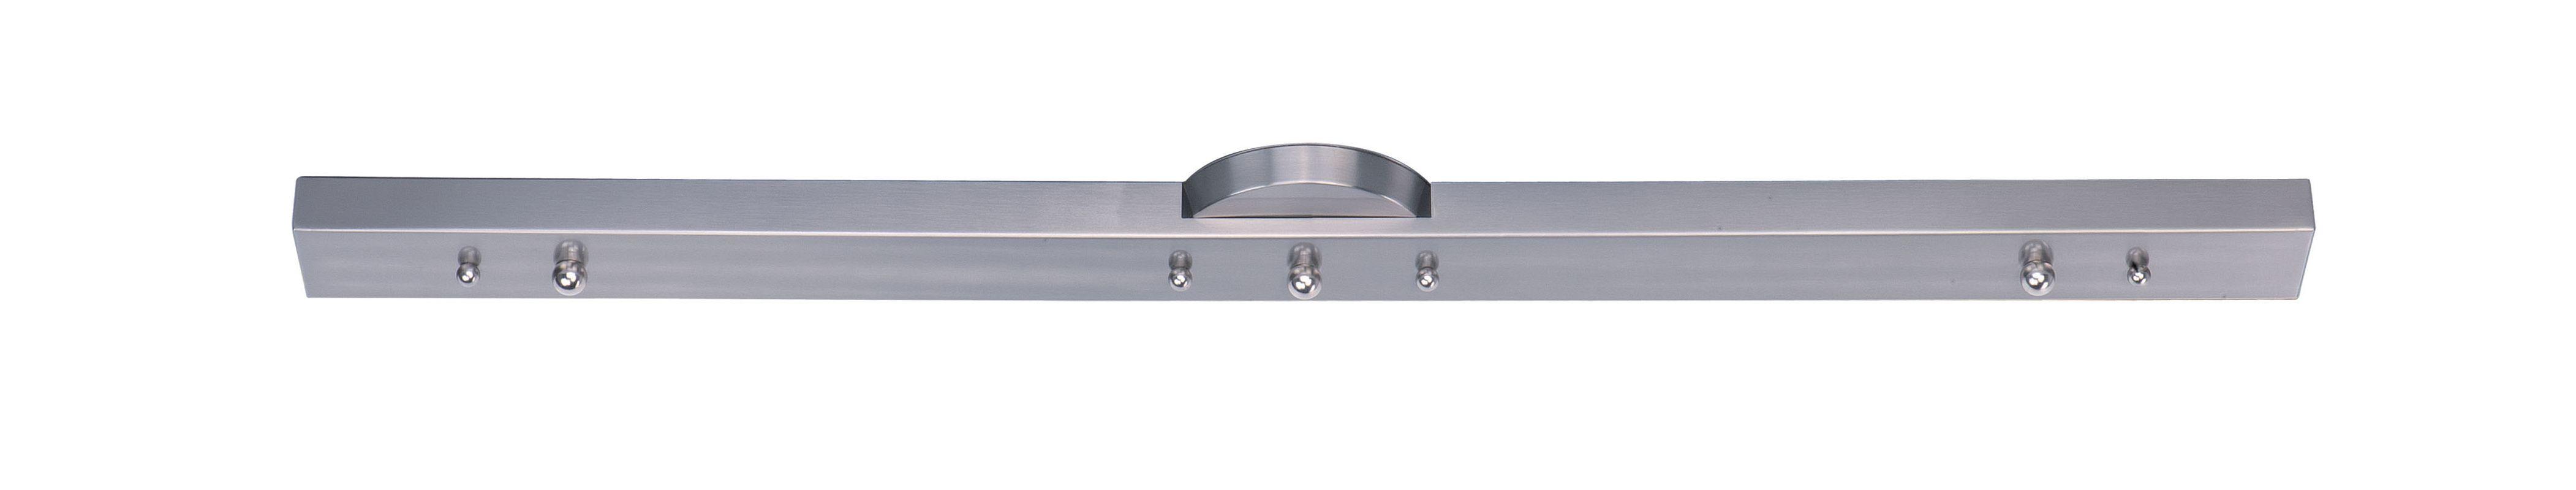 Maxim 91000 3 Light Linear Canopy for Mini Pendants Satin Nickel